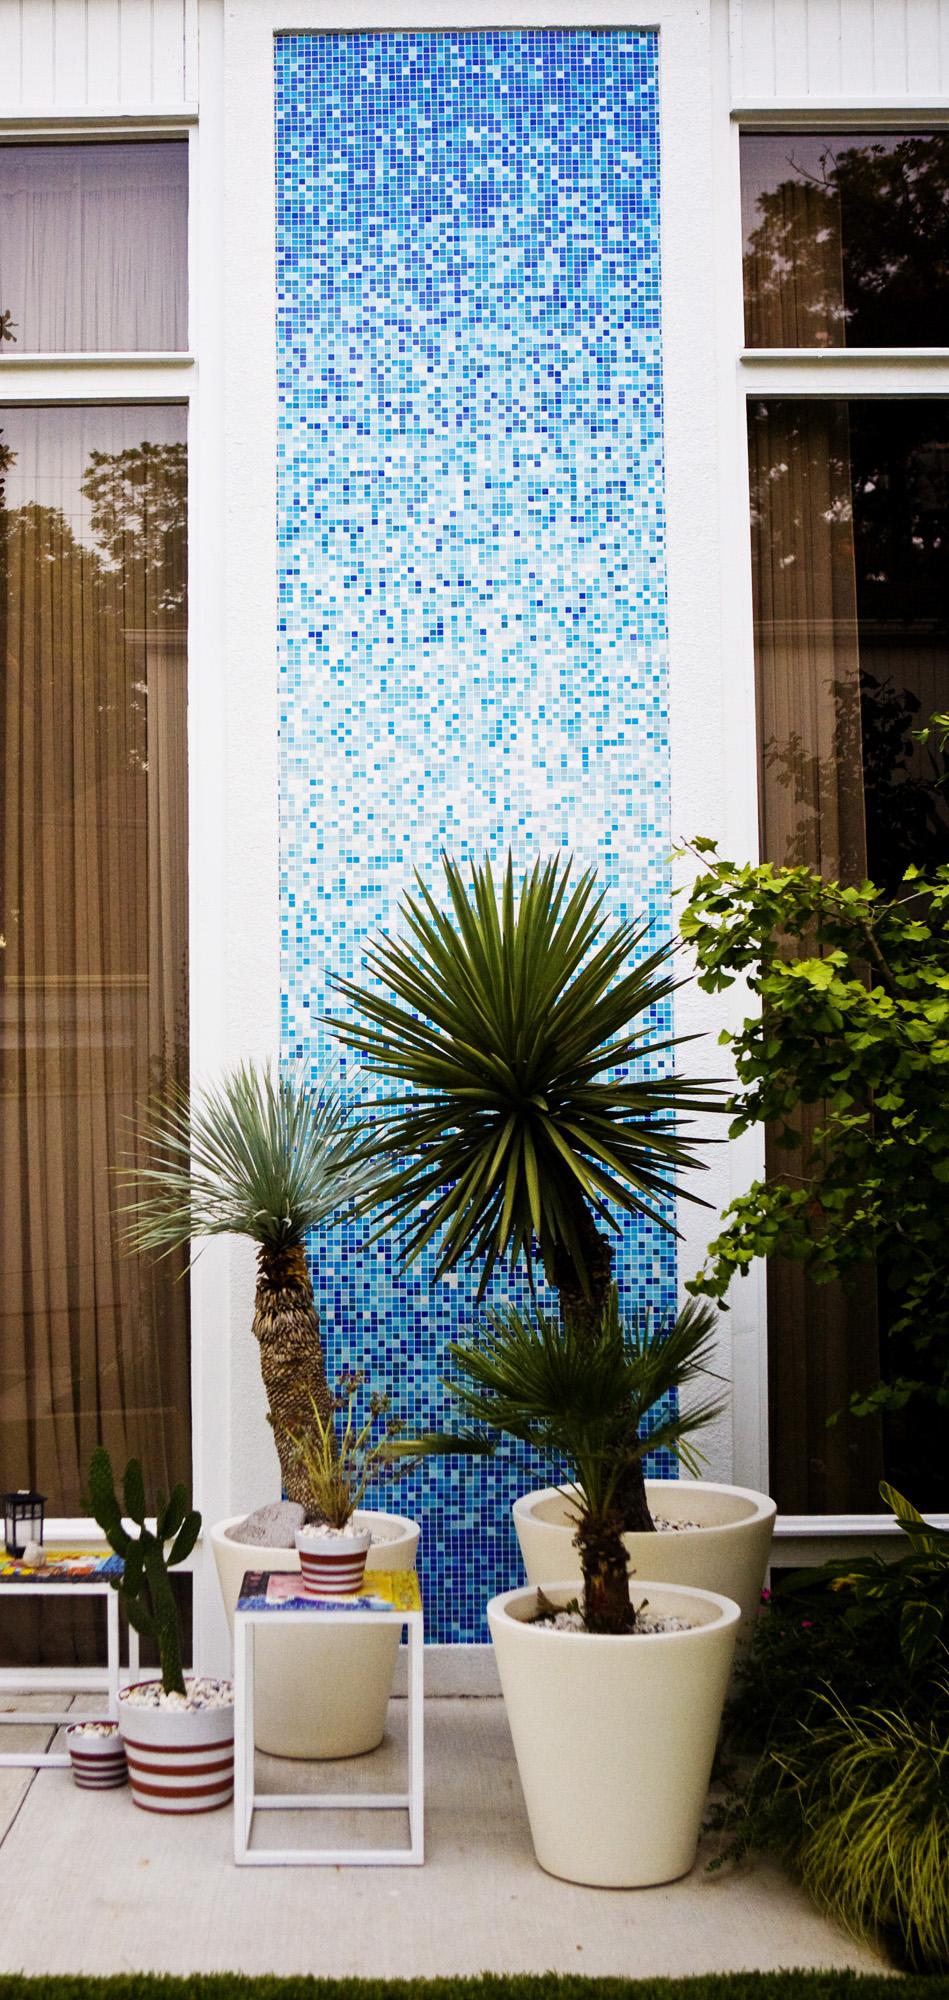 Modern Mosaic Wall _MG_3488.jpg